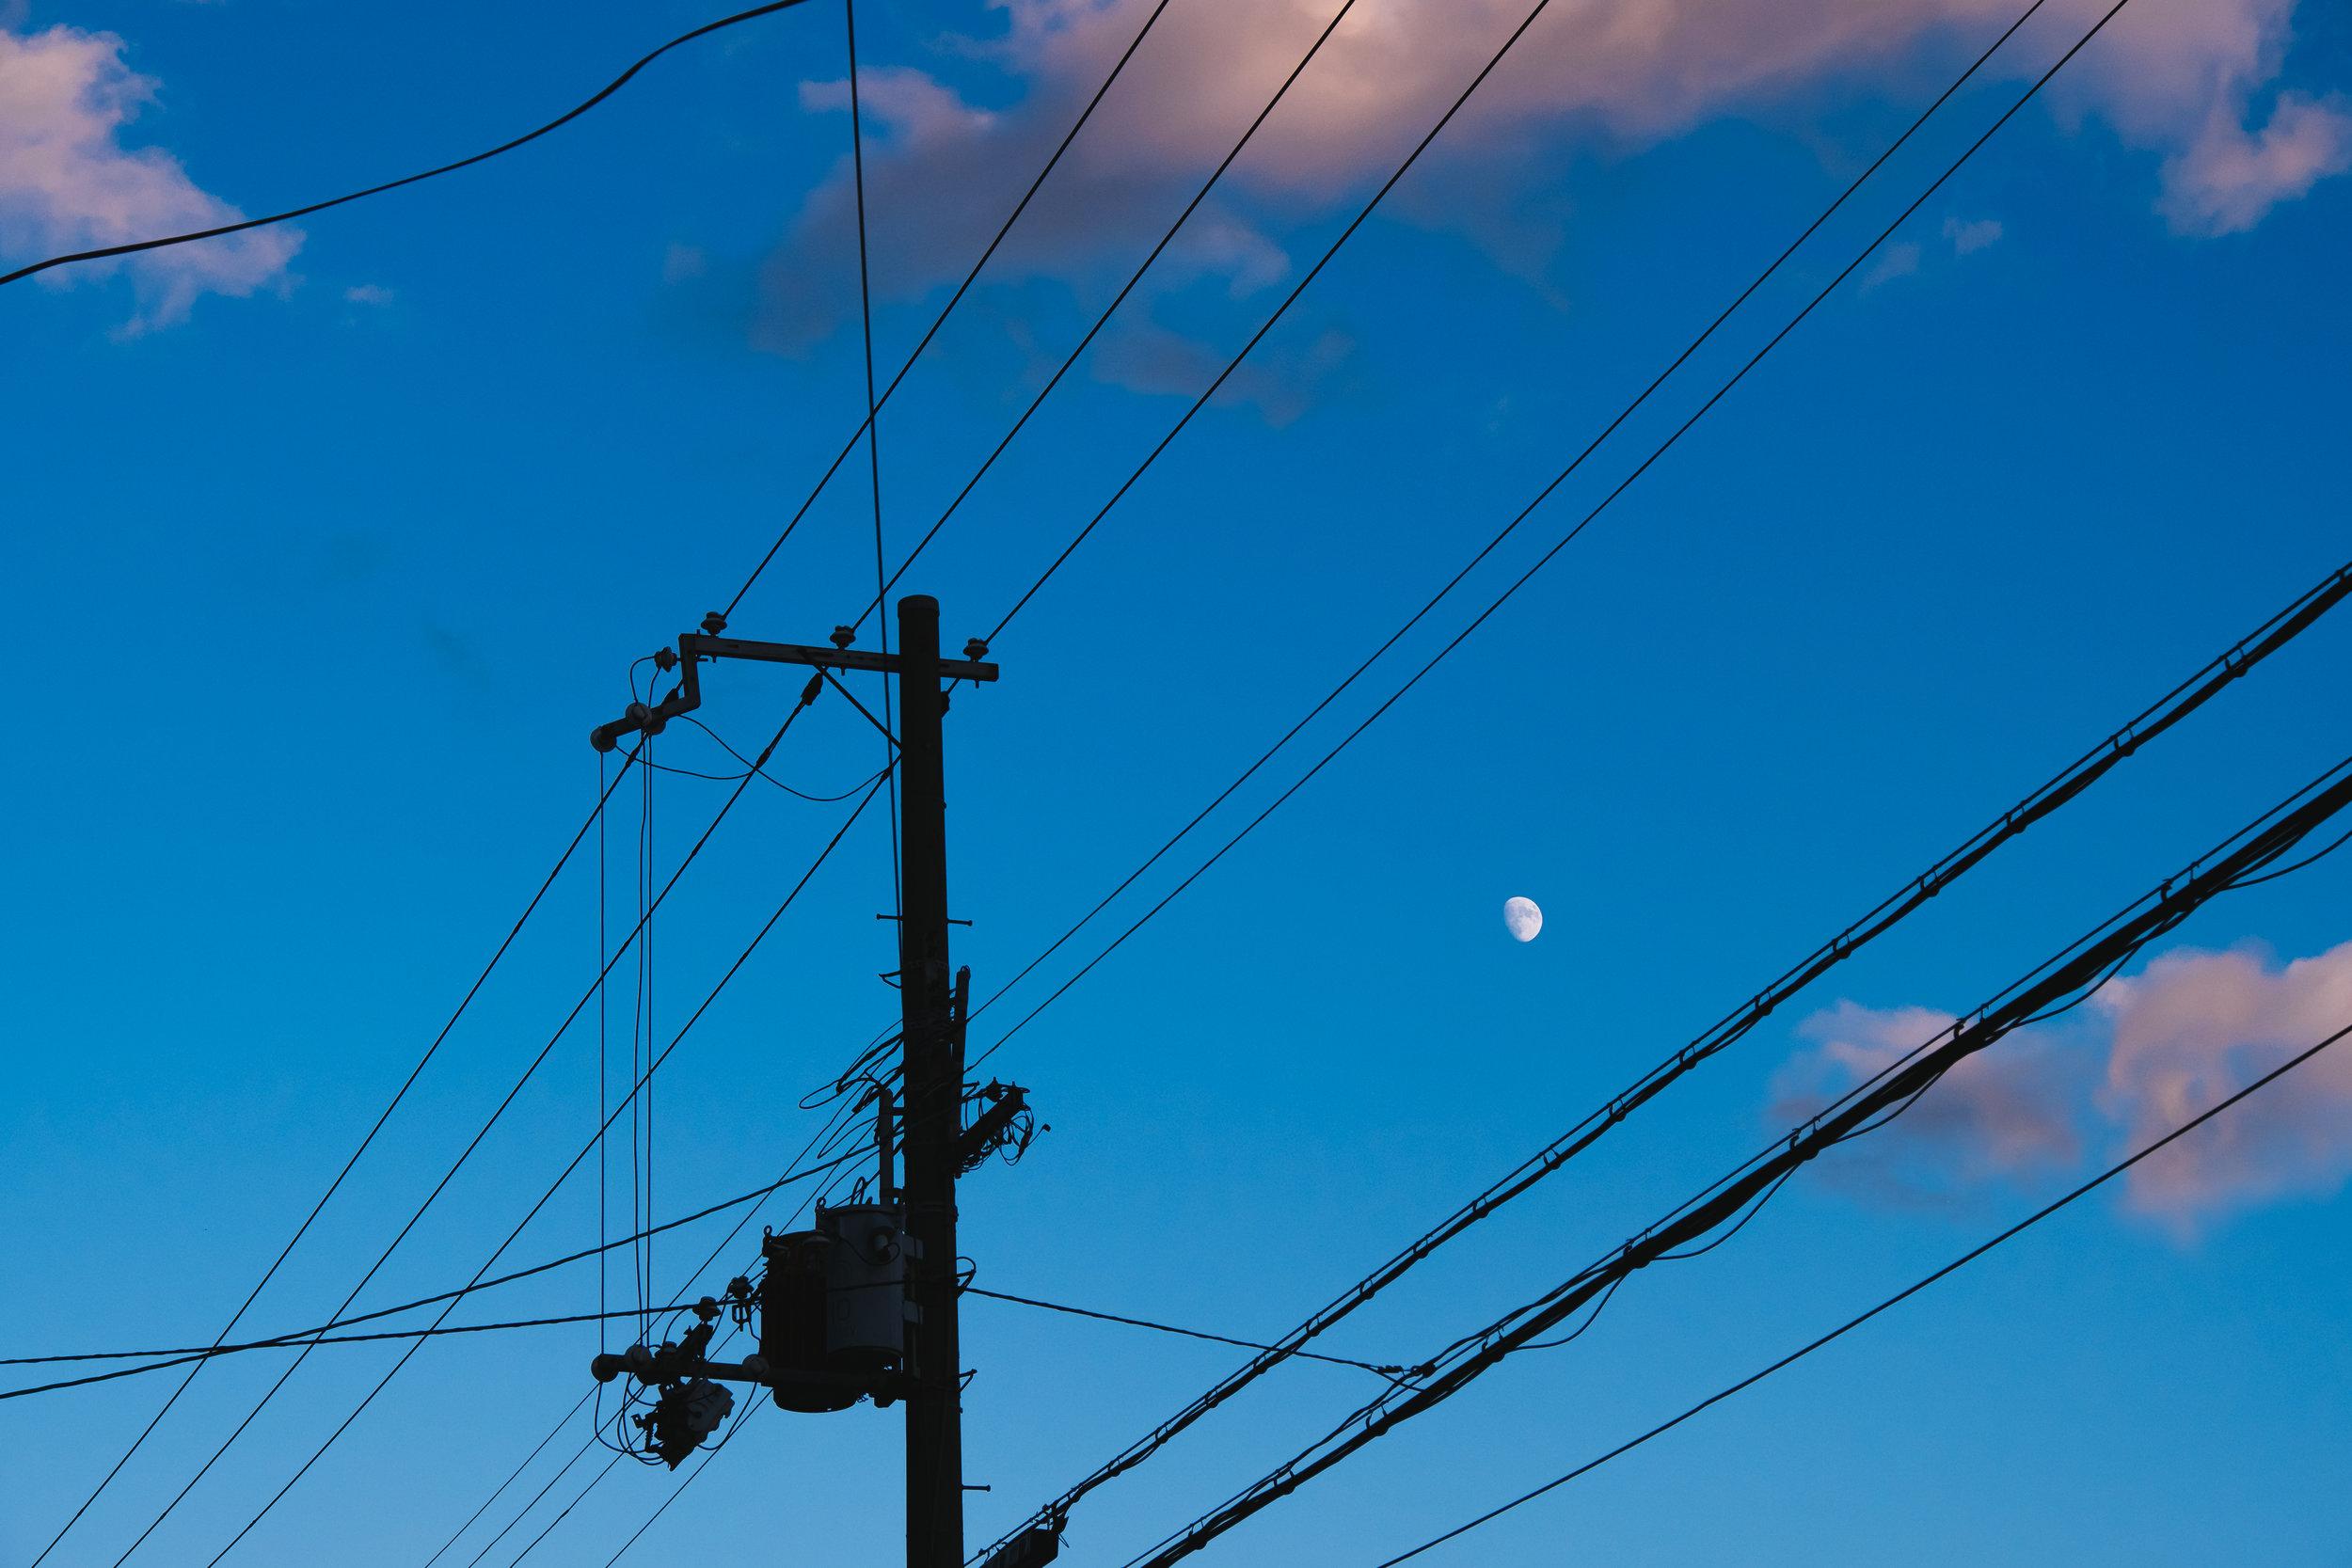 moon-wires.jpg